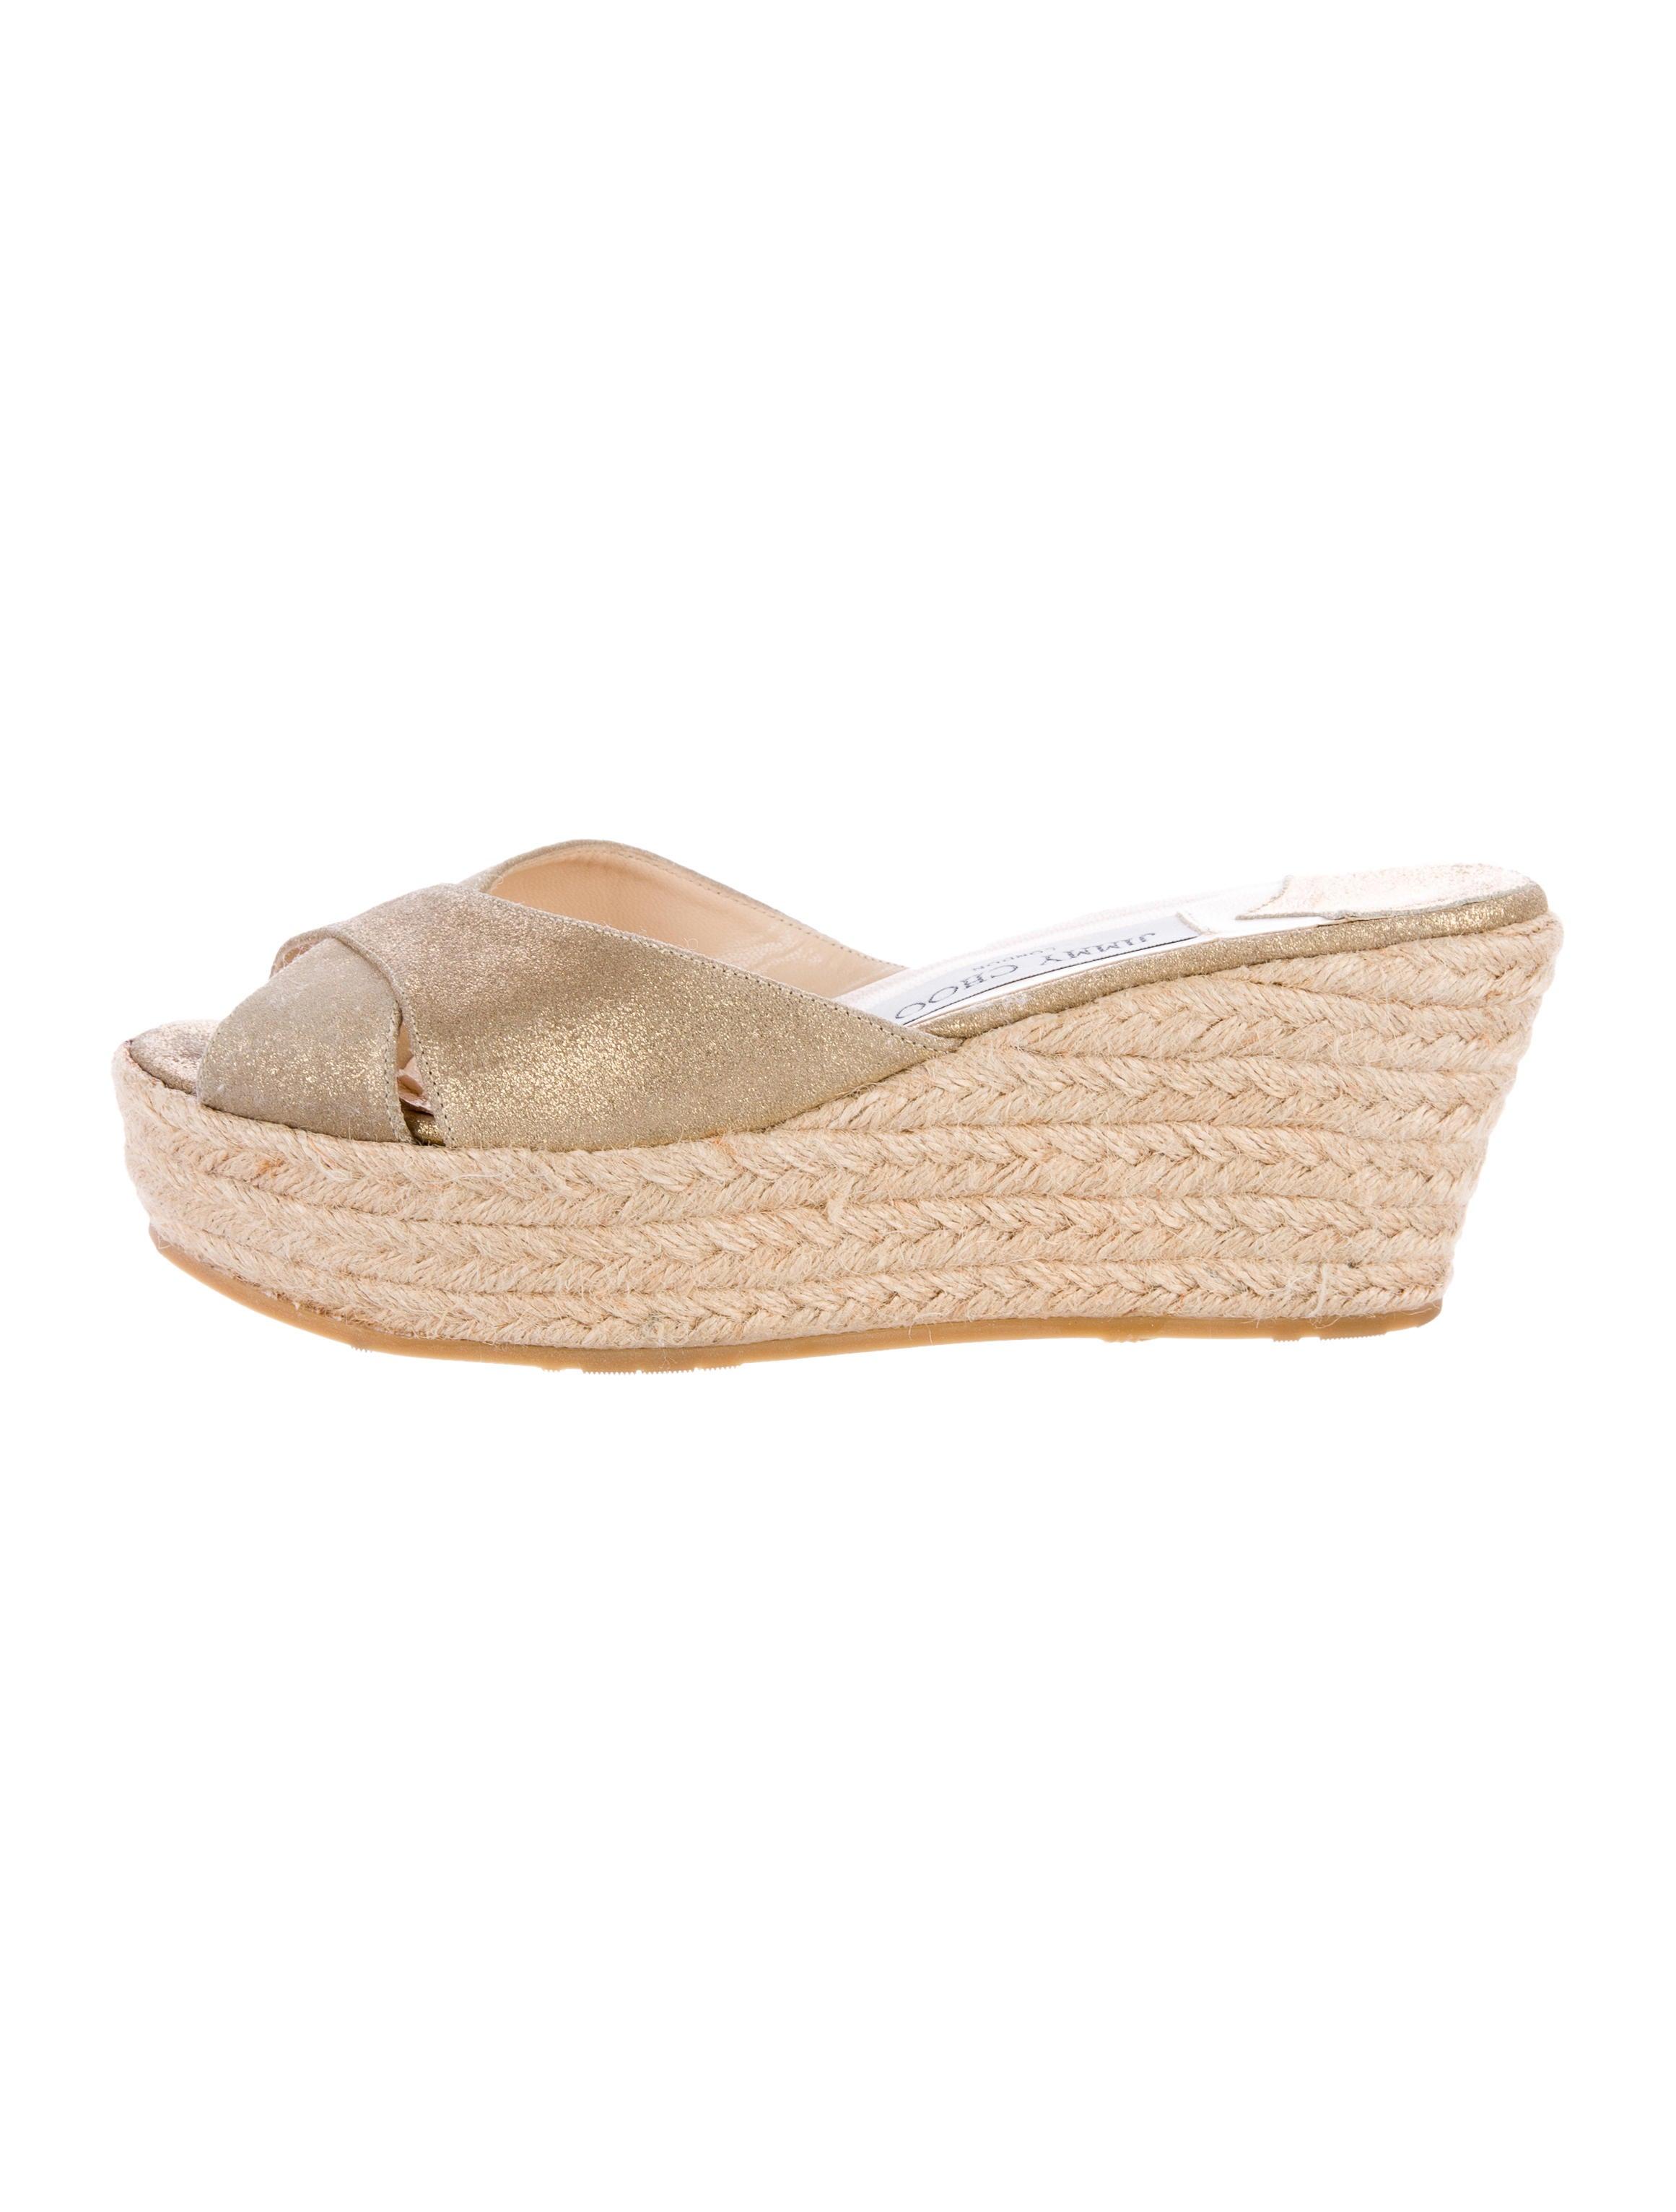 jimmy choo espadrille wedge sandals shoes jim60264